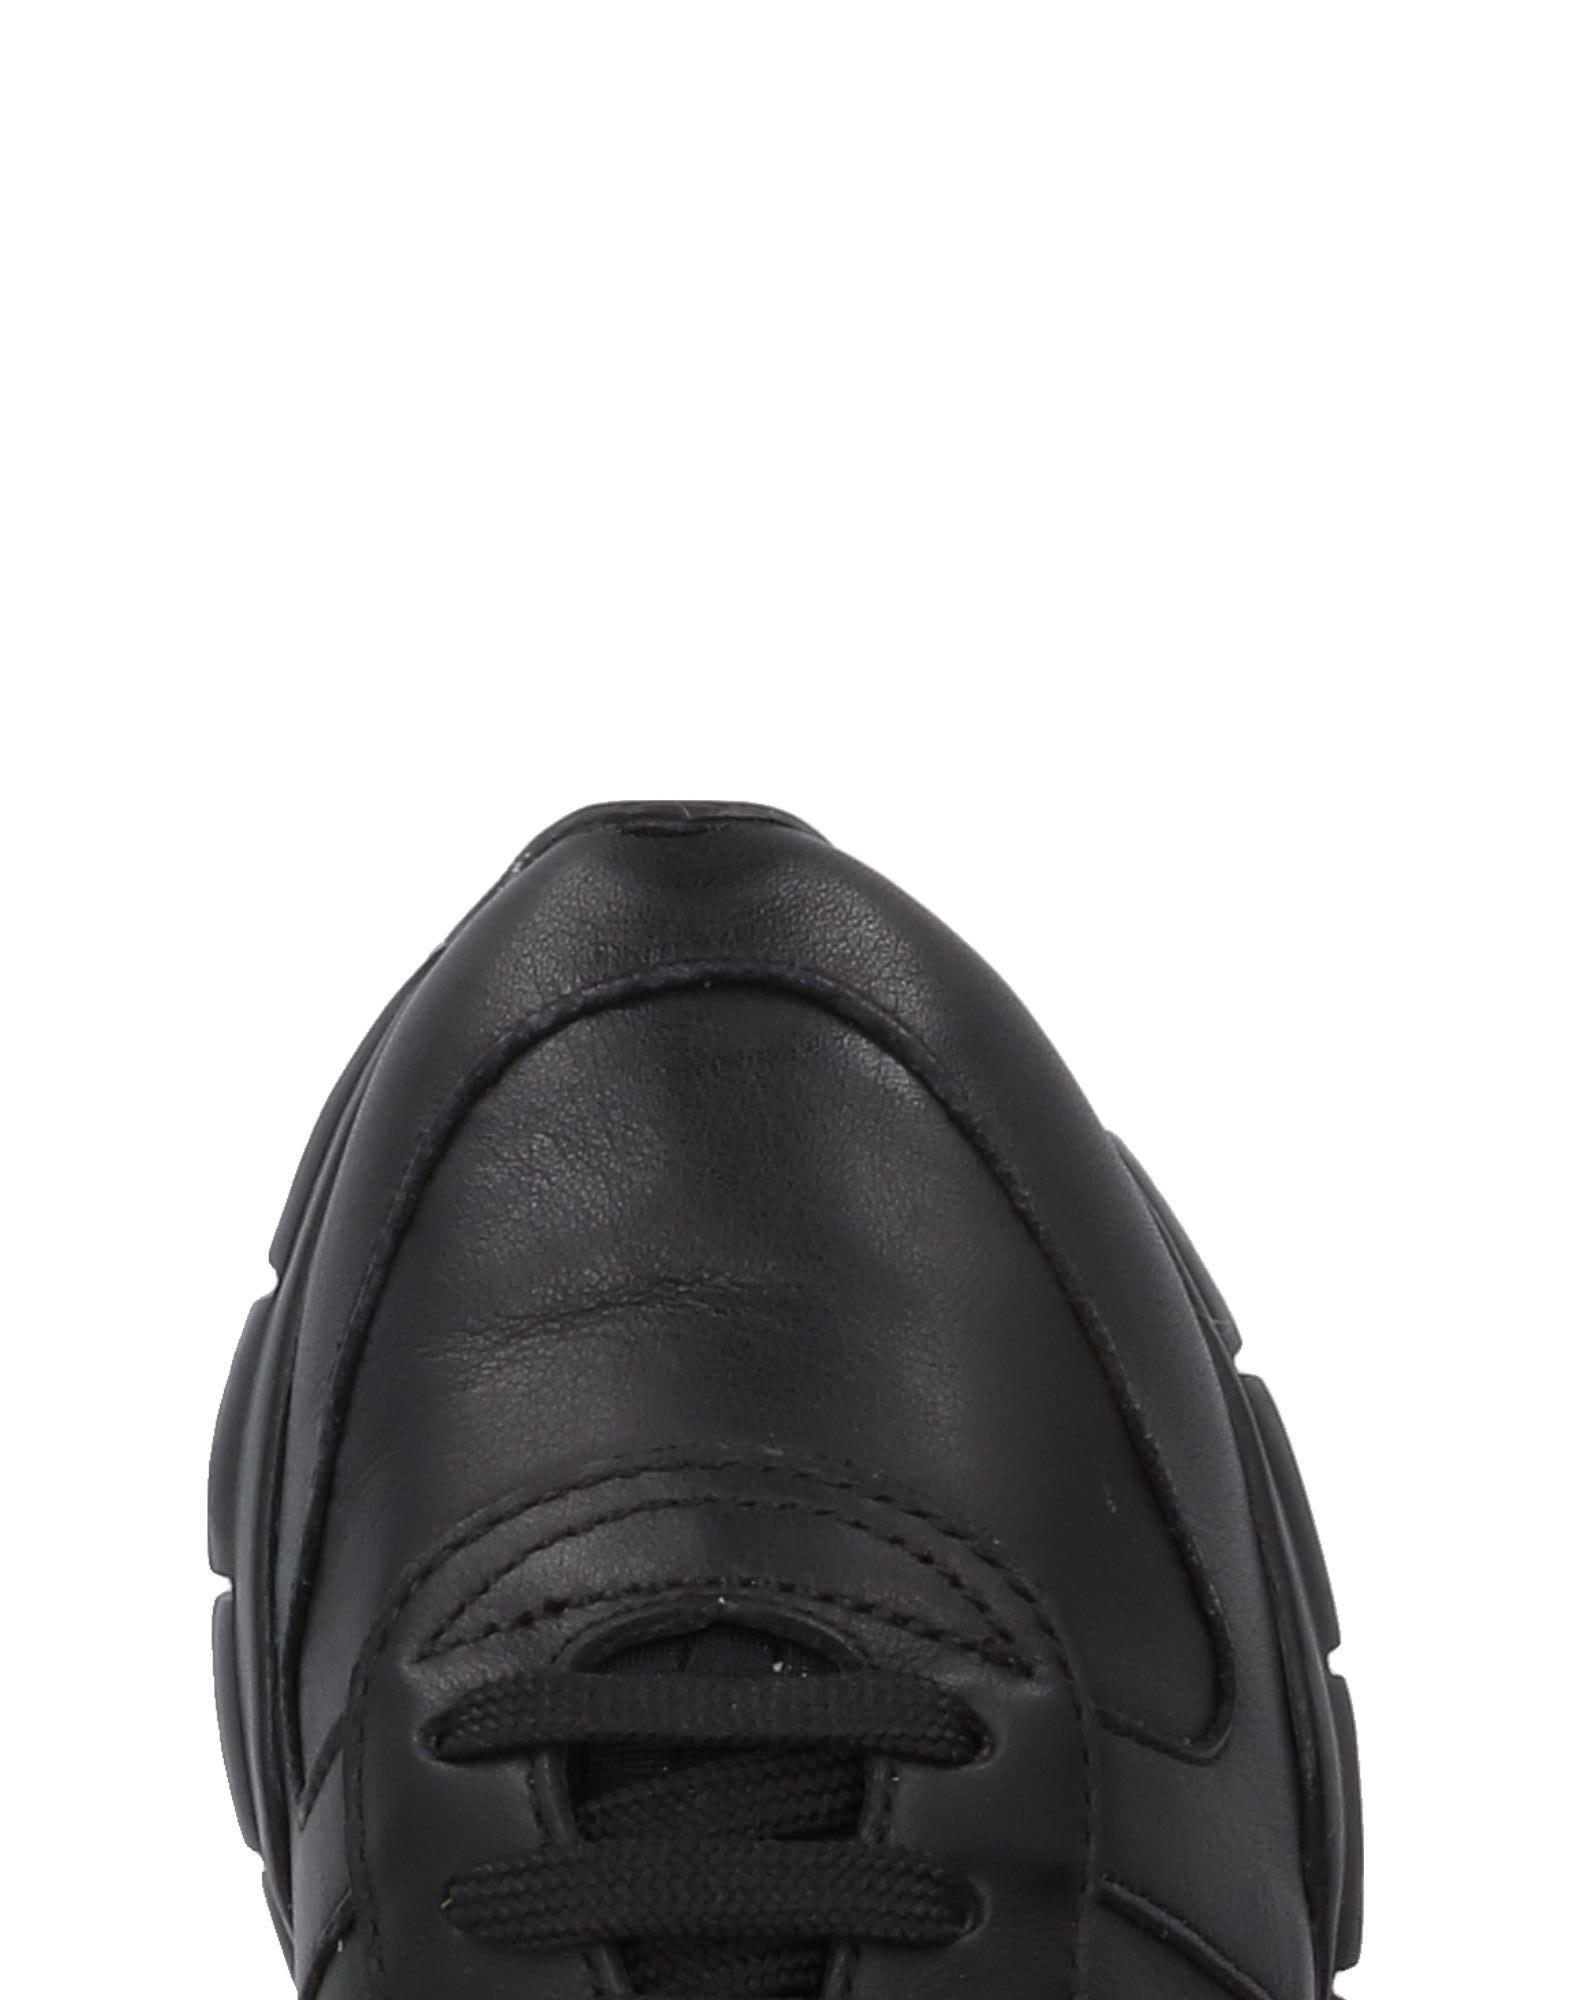 Geox 11489252DR Turnschuhes Damen 11489252DR Geox Gute Qualität beliebte Schuhe 61214b